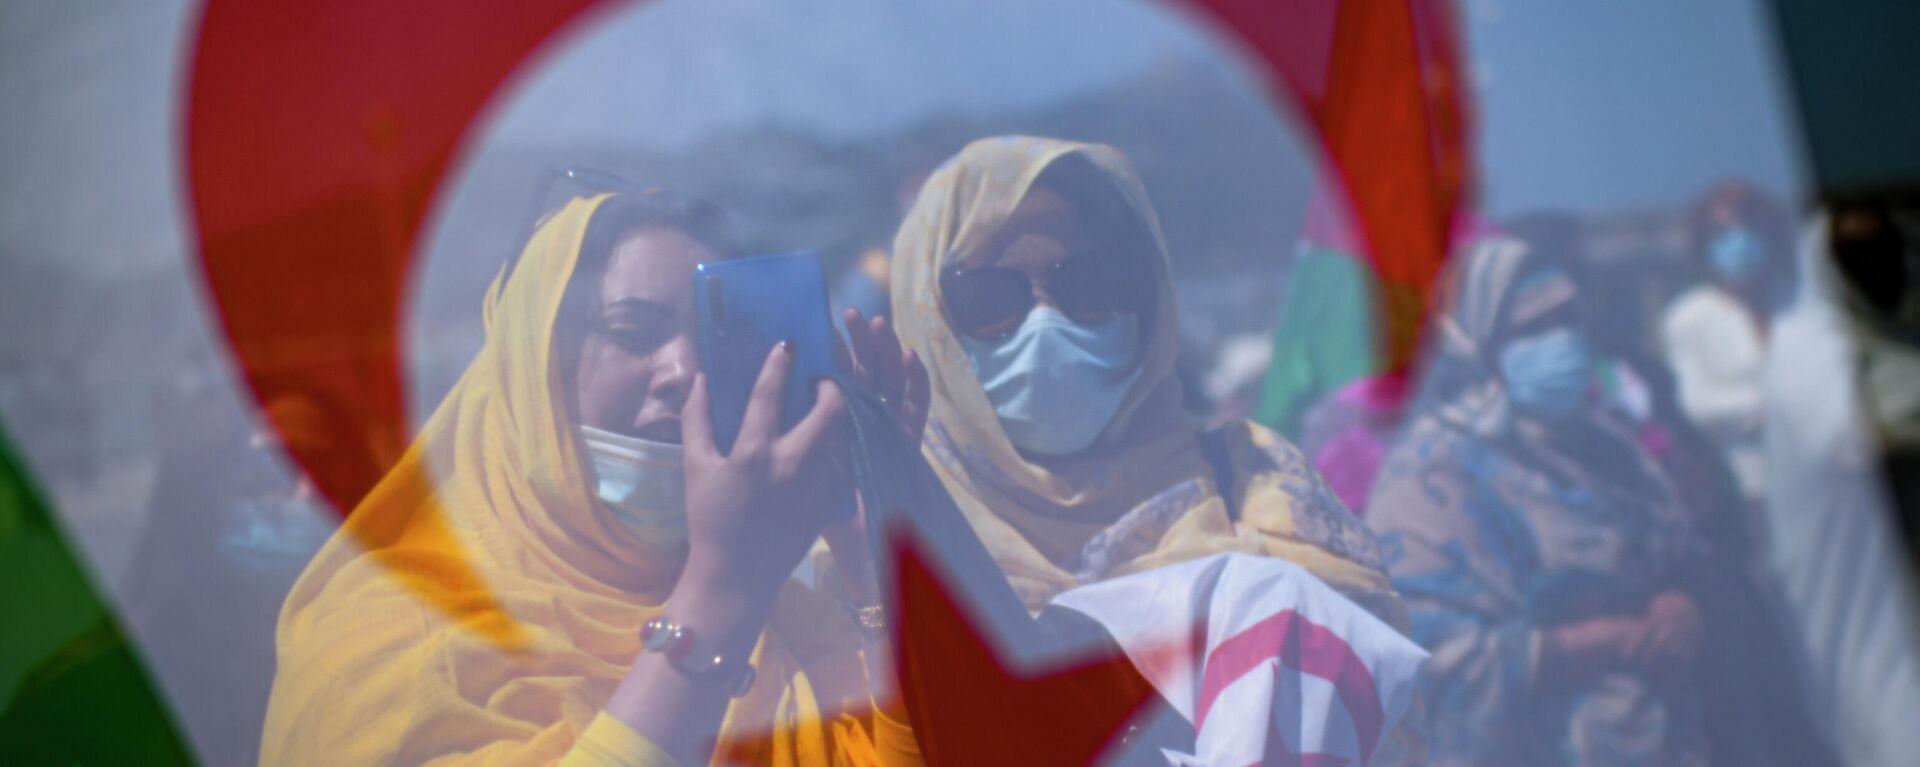 Manifestantes saharauies - Sputnik Mundo, 1920, 01.10.2021